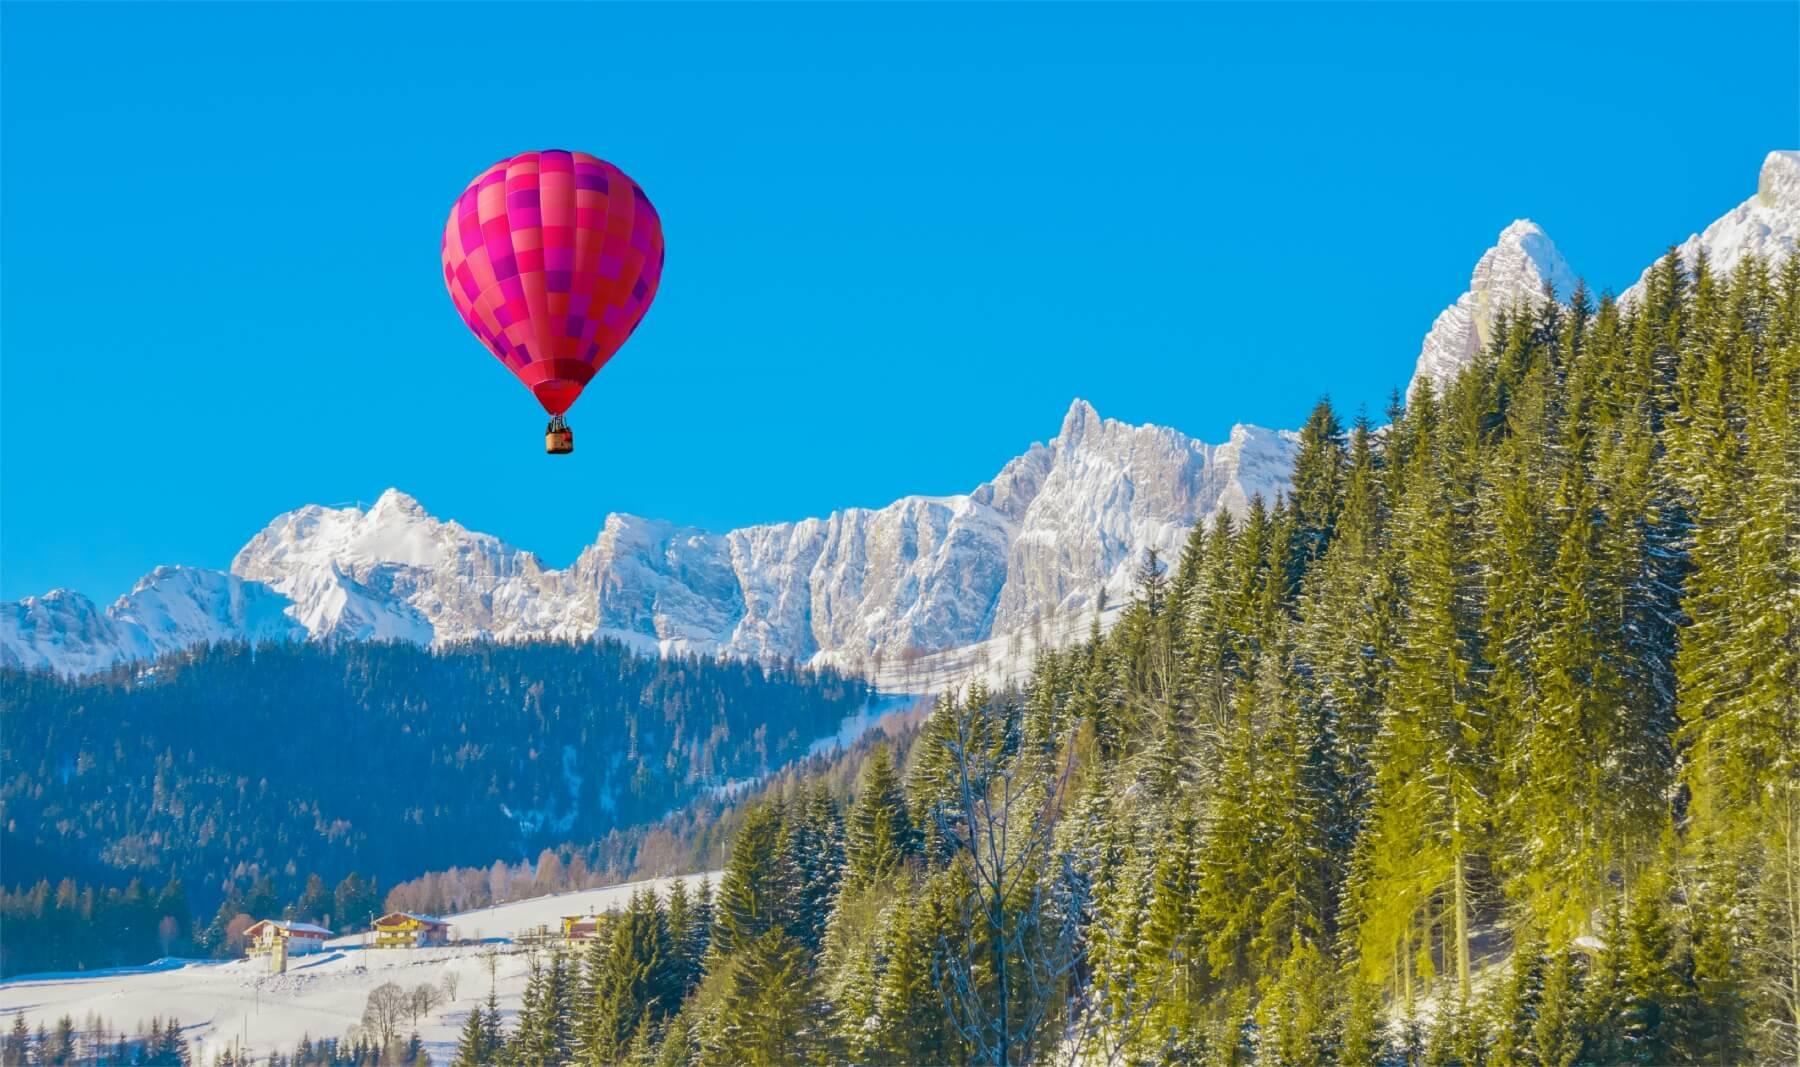 Ballonfahrten über den Alpen